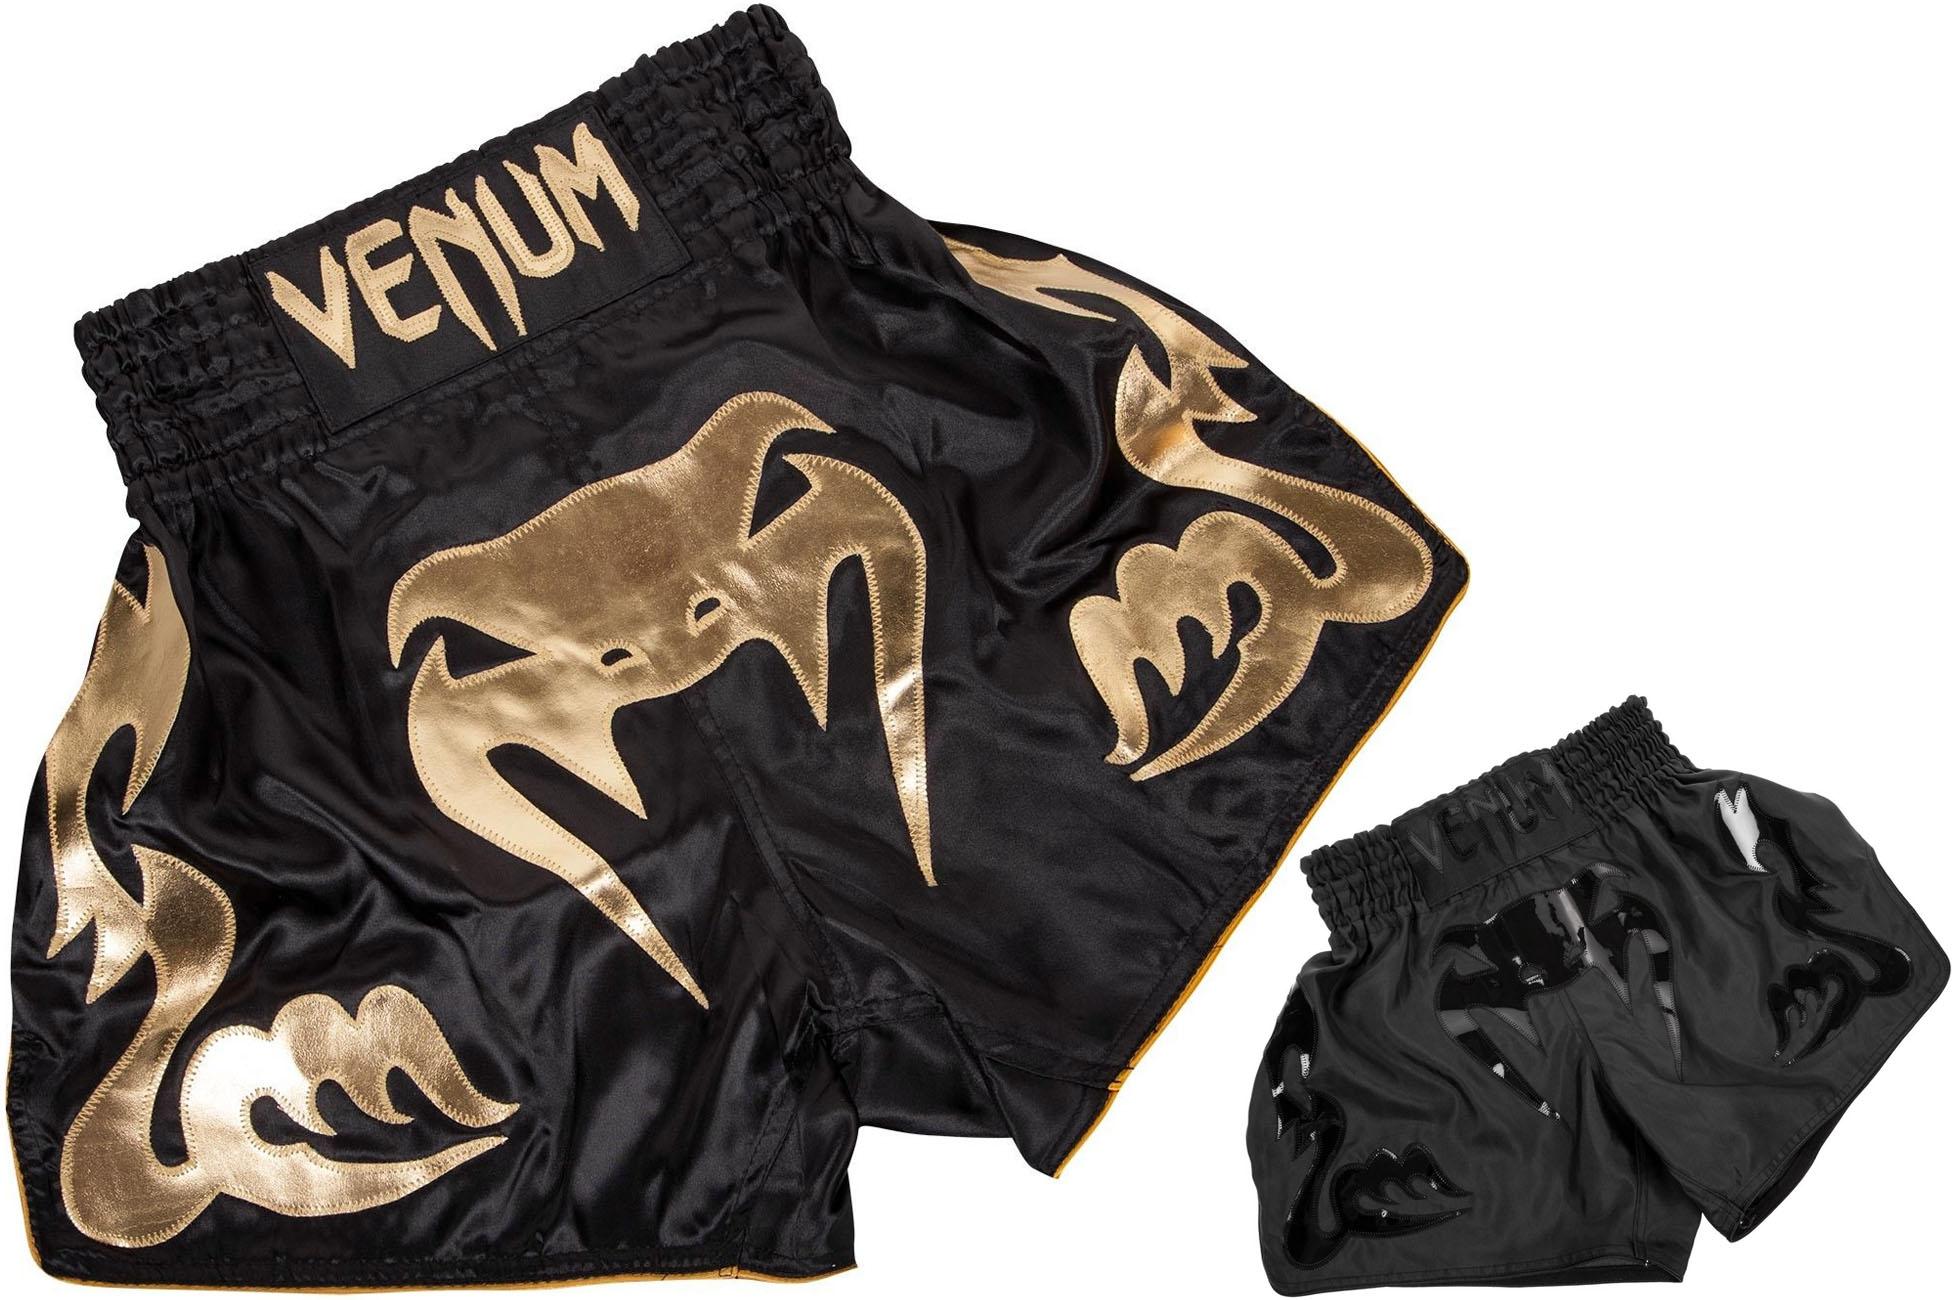 Pantalones Cortos Des Muay Thai Bangkok Inferno Venum Dragonsports Eu